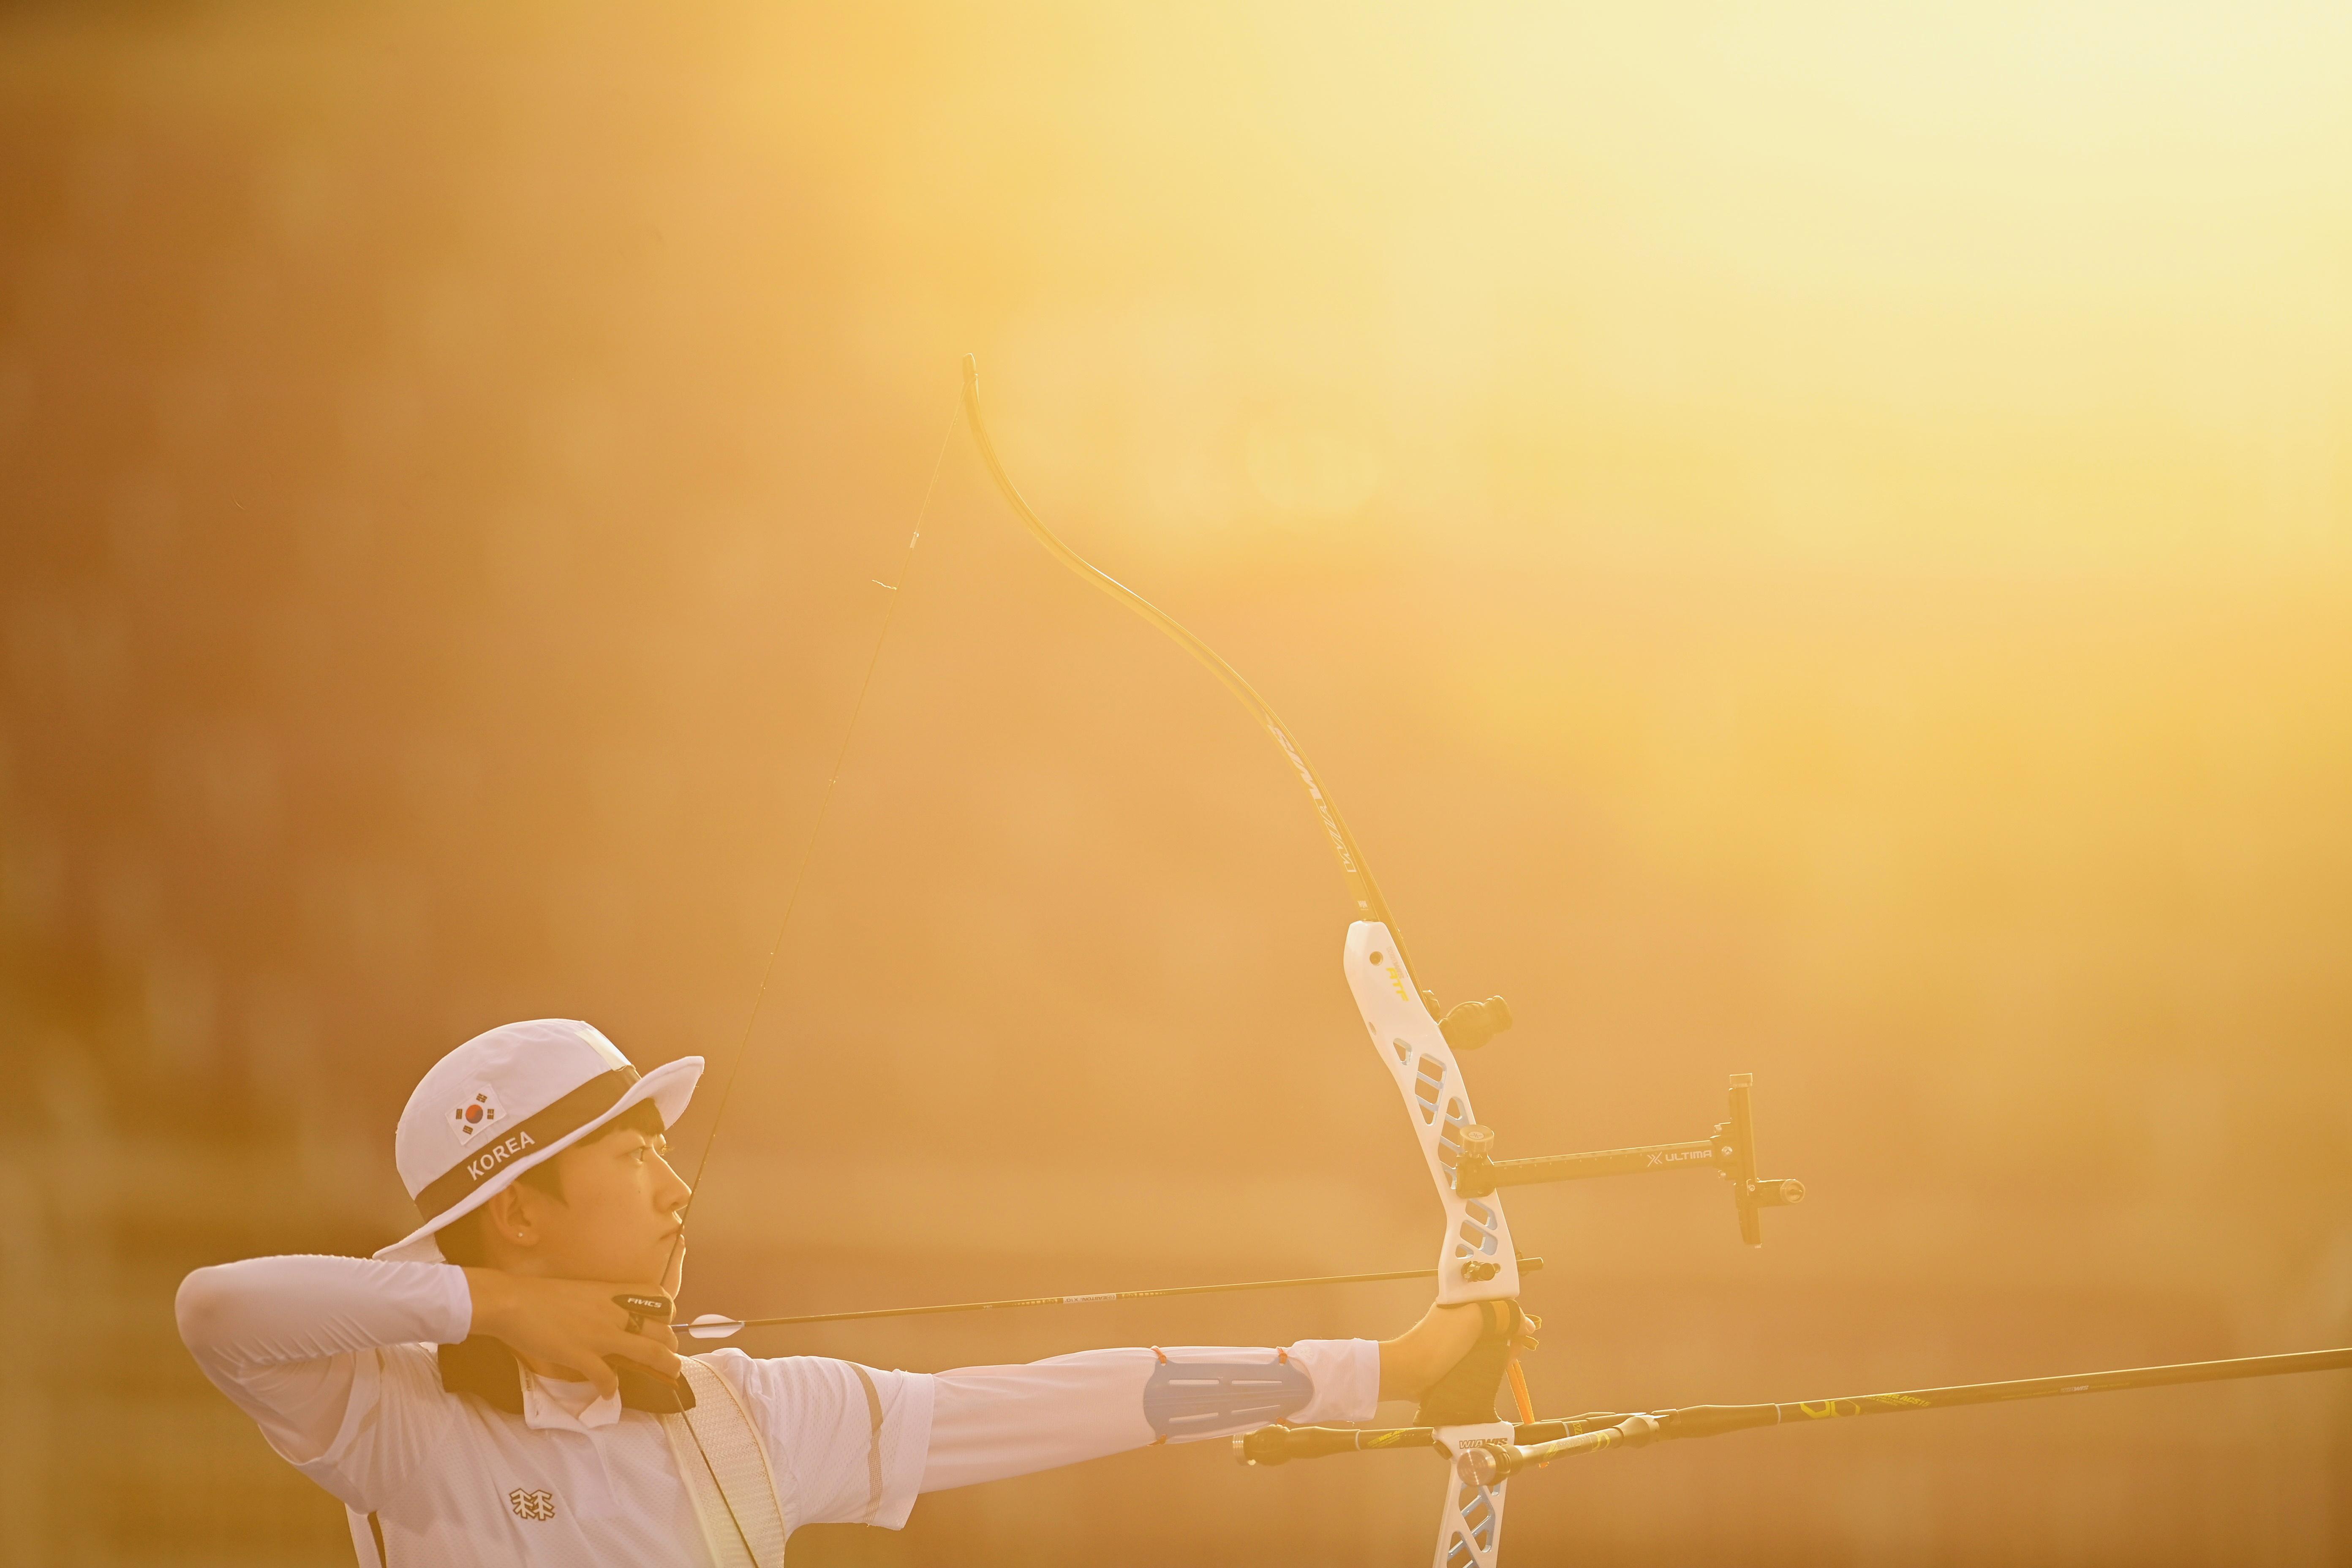 Tokyo 2020 Olympics - Archery - Women's Individual - 1/32 Finals - Yumenoshima Archery Field, Tokyo, Japan - July 29, 2021. An San of South Korea in action REUTERS/Clodagh Kilcoyne